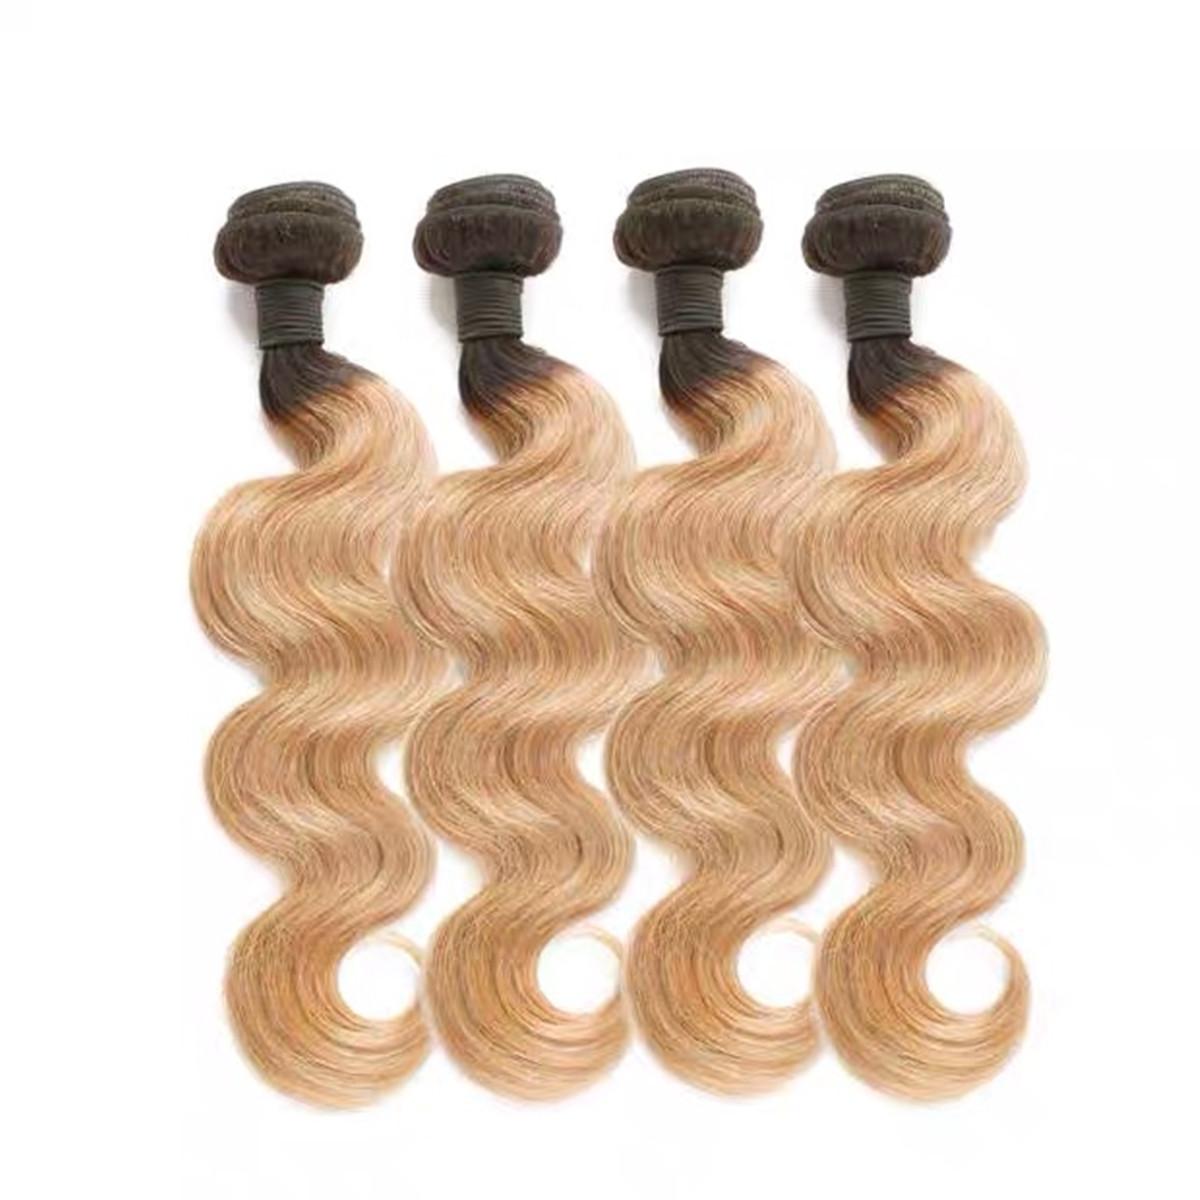 LEDON Hair Weft, Bodywave BW, color 1b/27,100% Human Hair Extensions,100g, 1 Piece